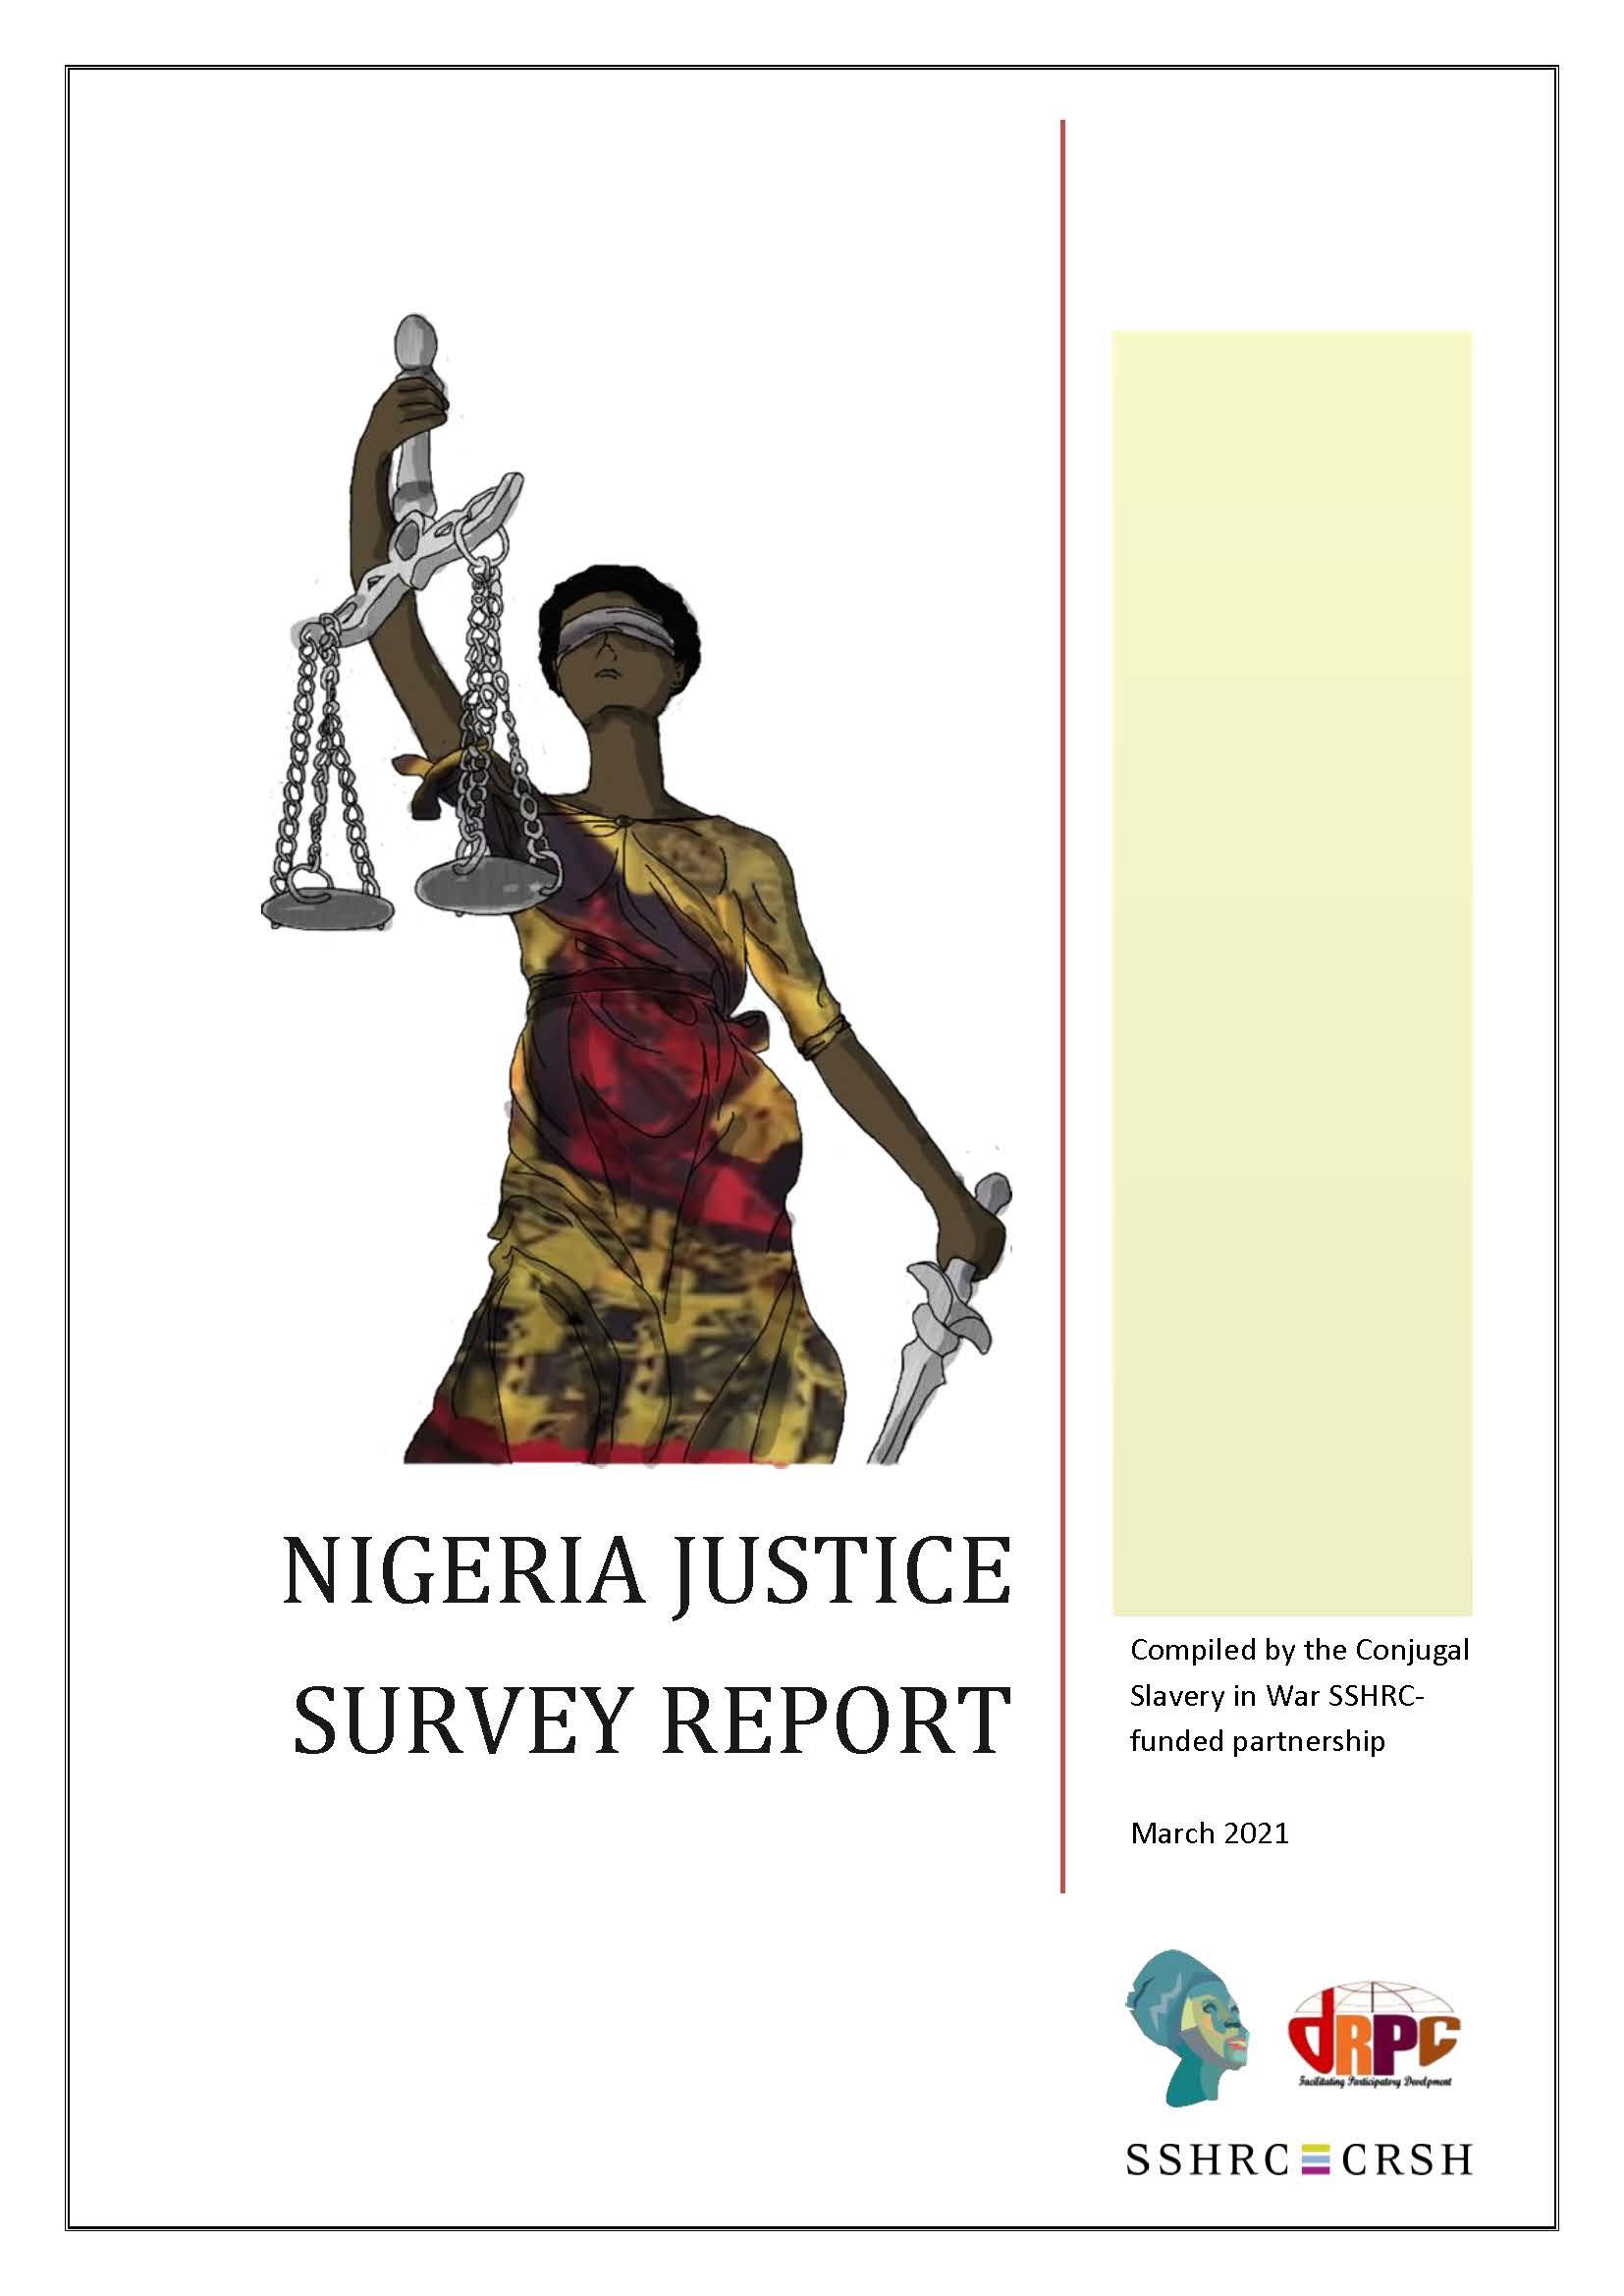 Nigeria Justice Survey Report